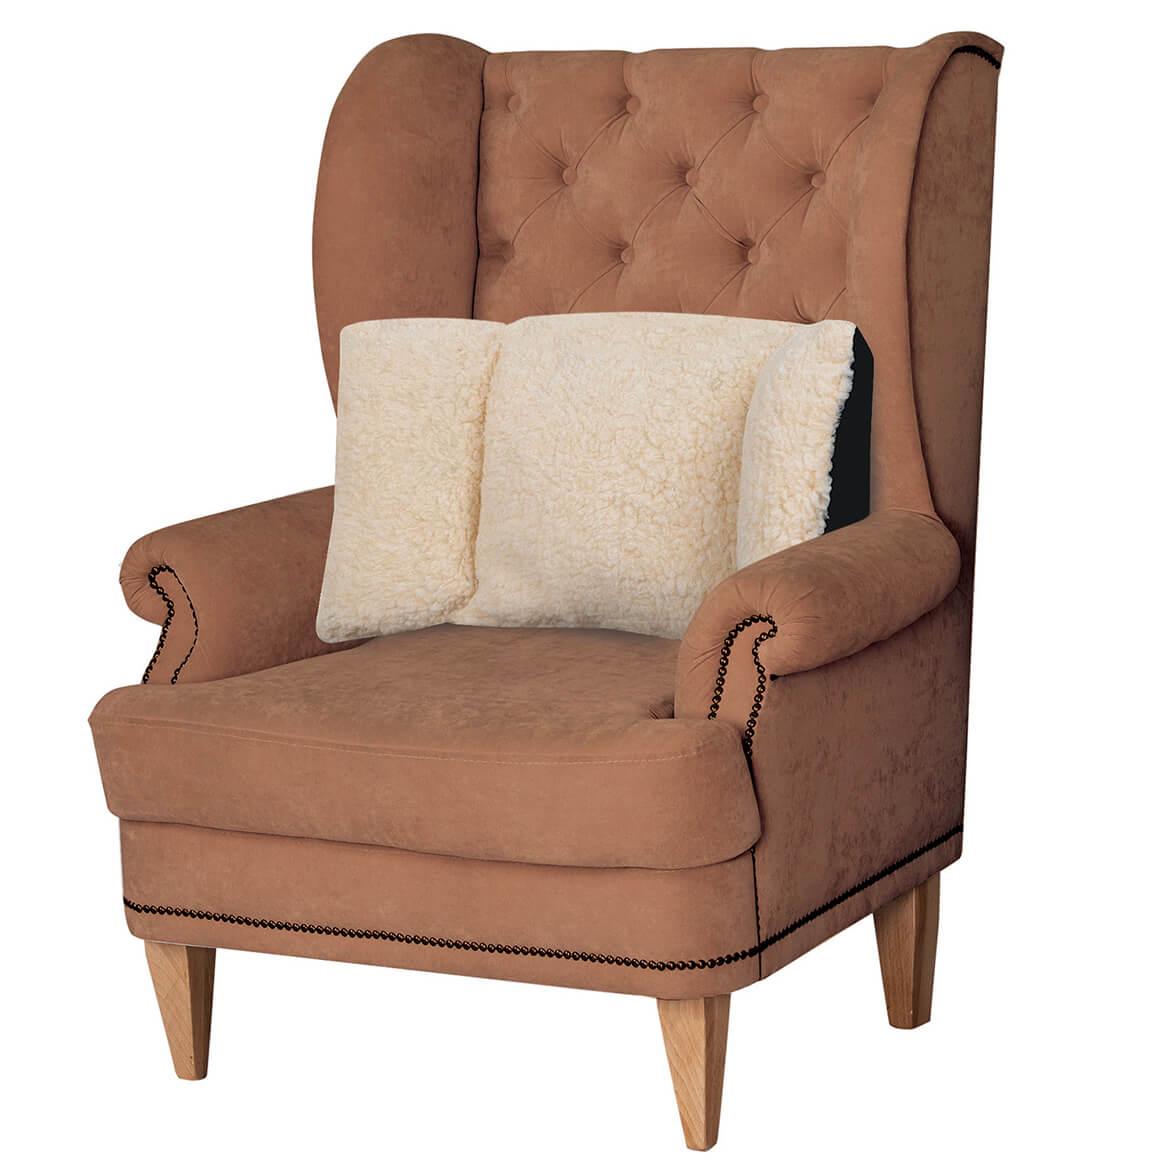 Triple Support Lumbar Cushion-370059